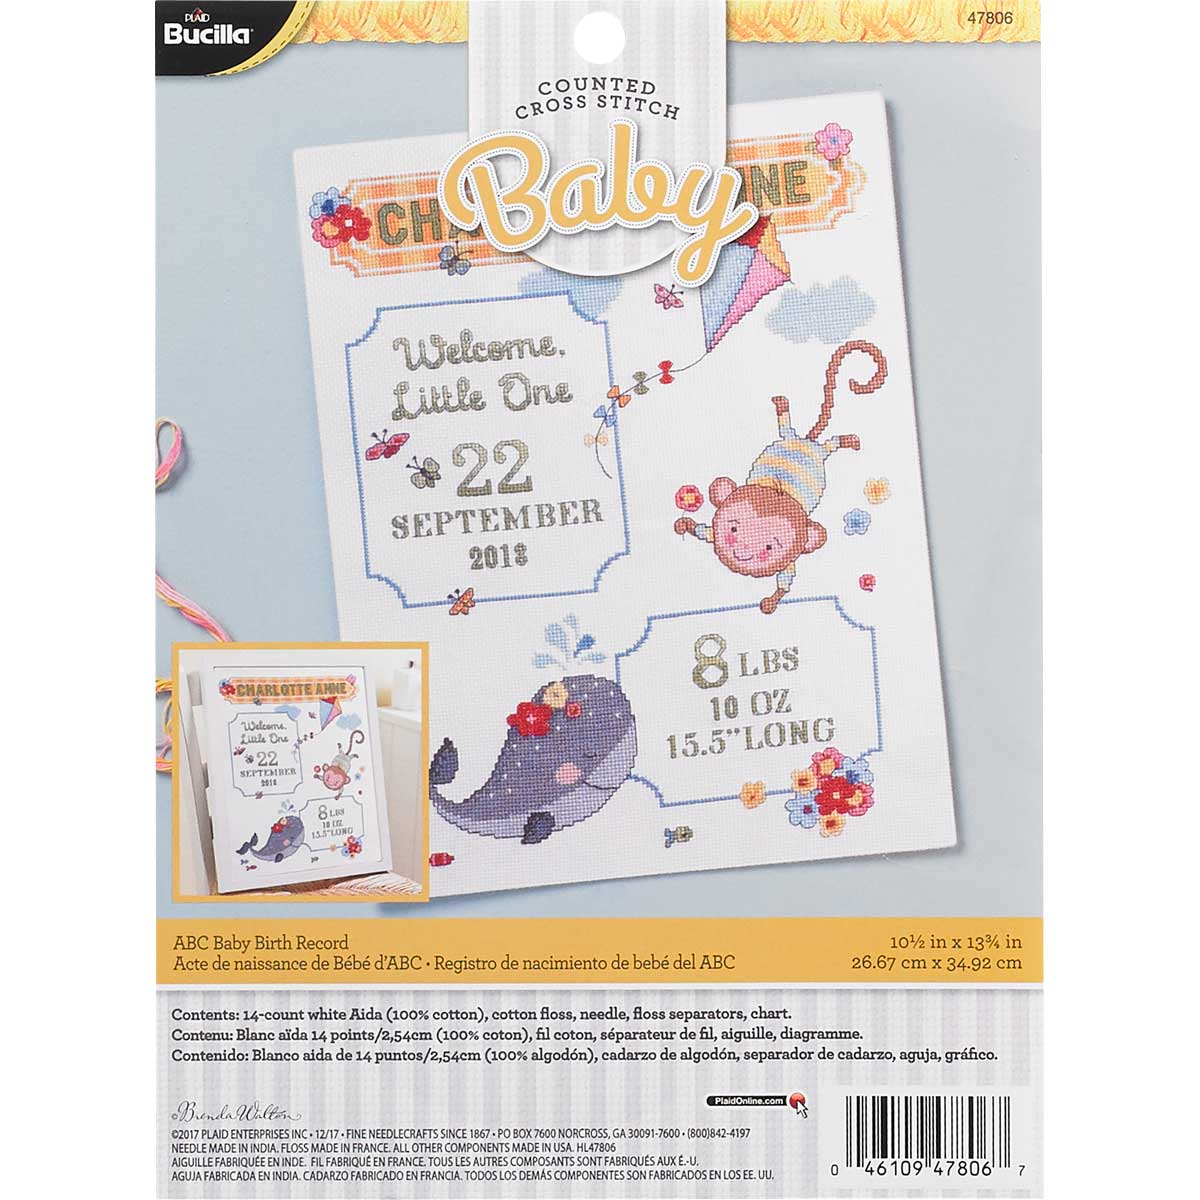 Bucilla ® Baby - Counted Cross Stitch - Crib Ensembles - ABC Baby - Birth Record Kit